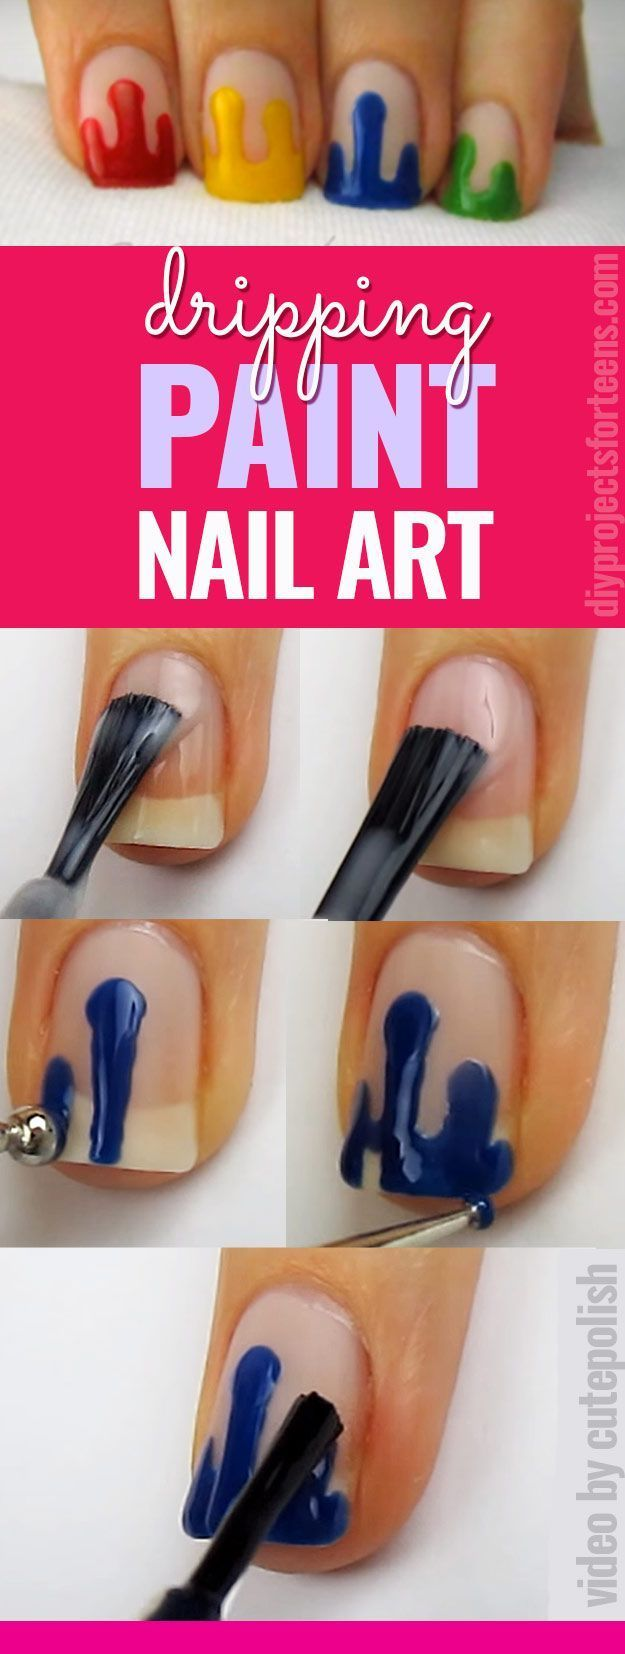 Cool Nail Art Ideas - Dripping Paint Nail Polish - Fun for Teens and ...